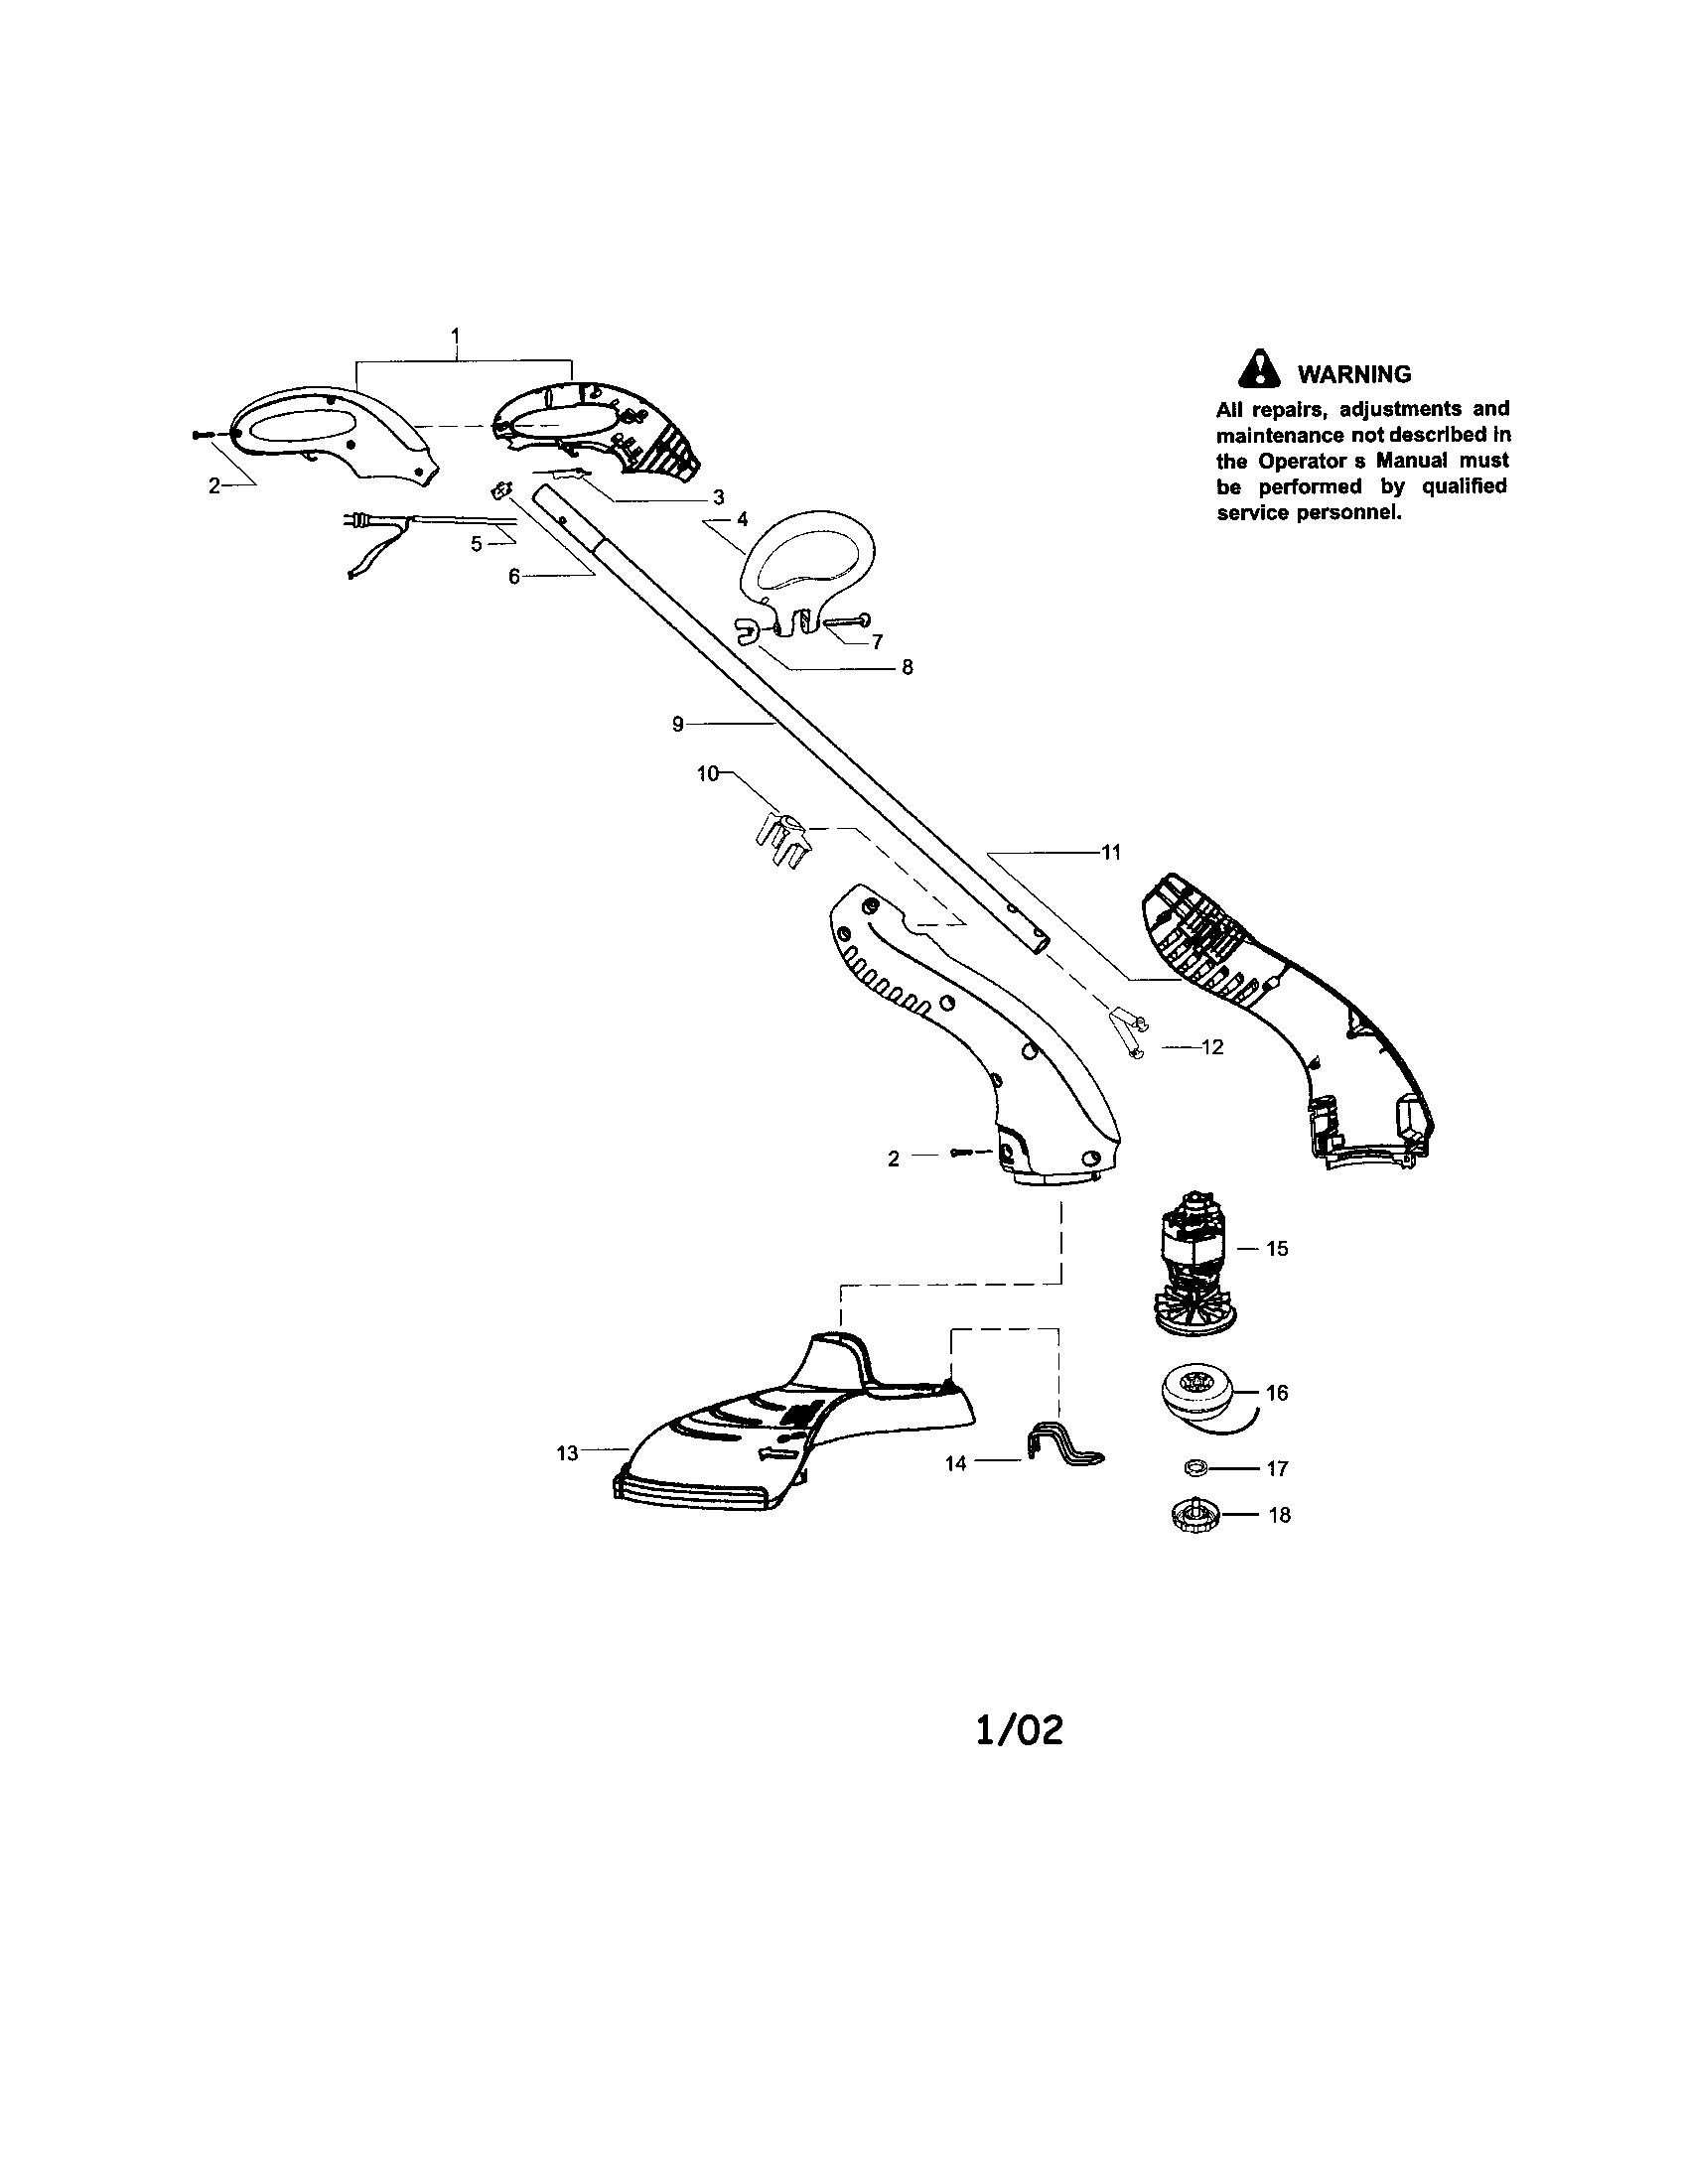 Craftsman model 358745250 line trimmers/weedwackers